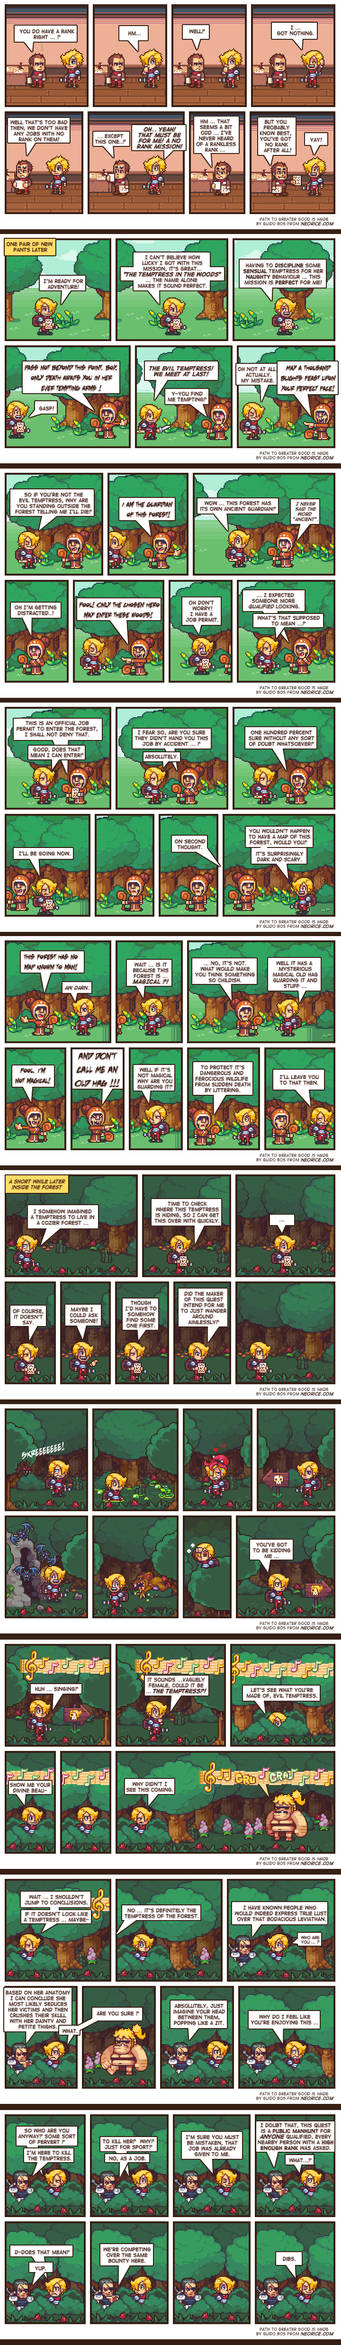 TOM RPG page 11-20